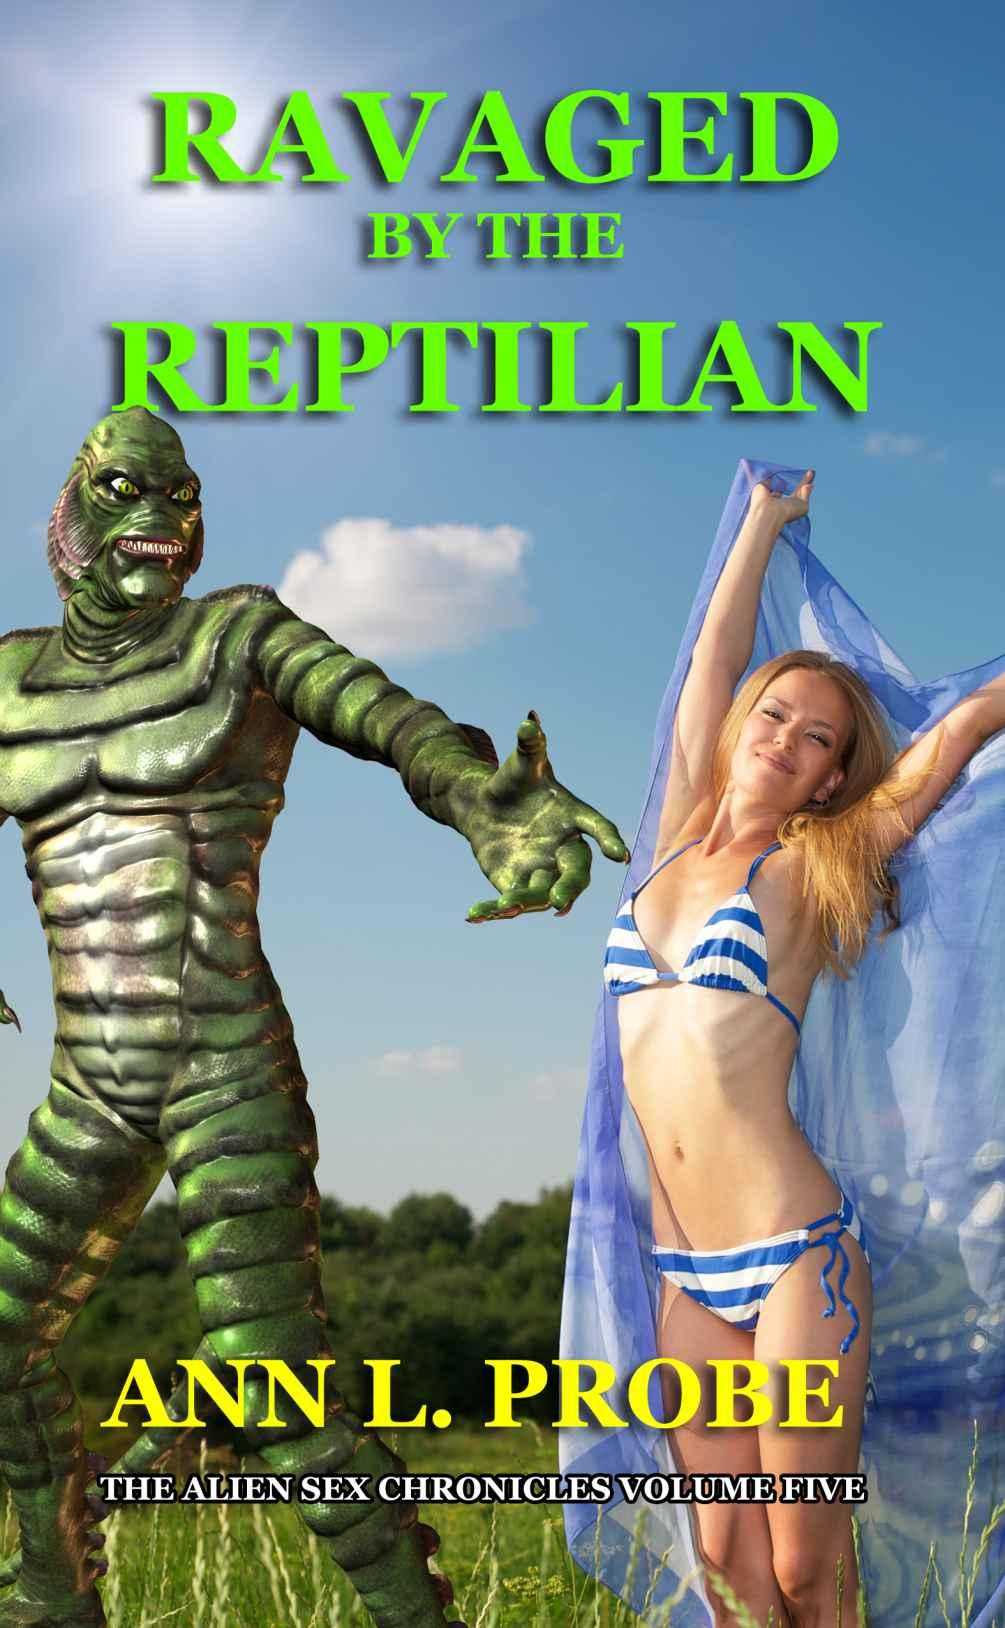 ravaged by the reptilian ann l. probe